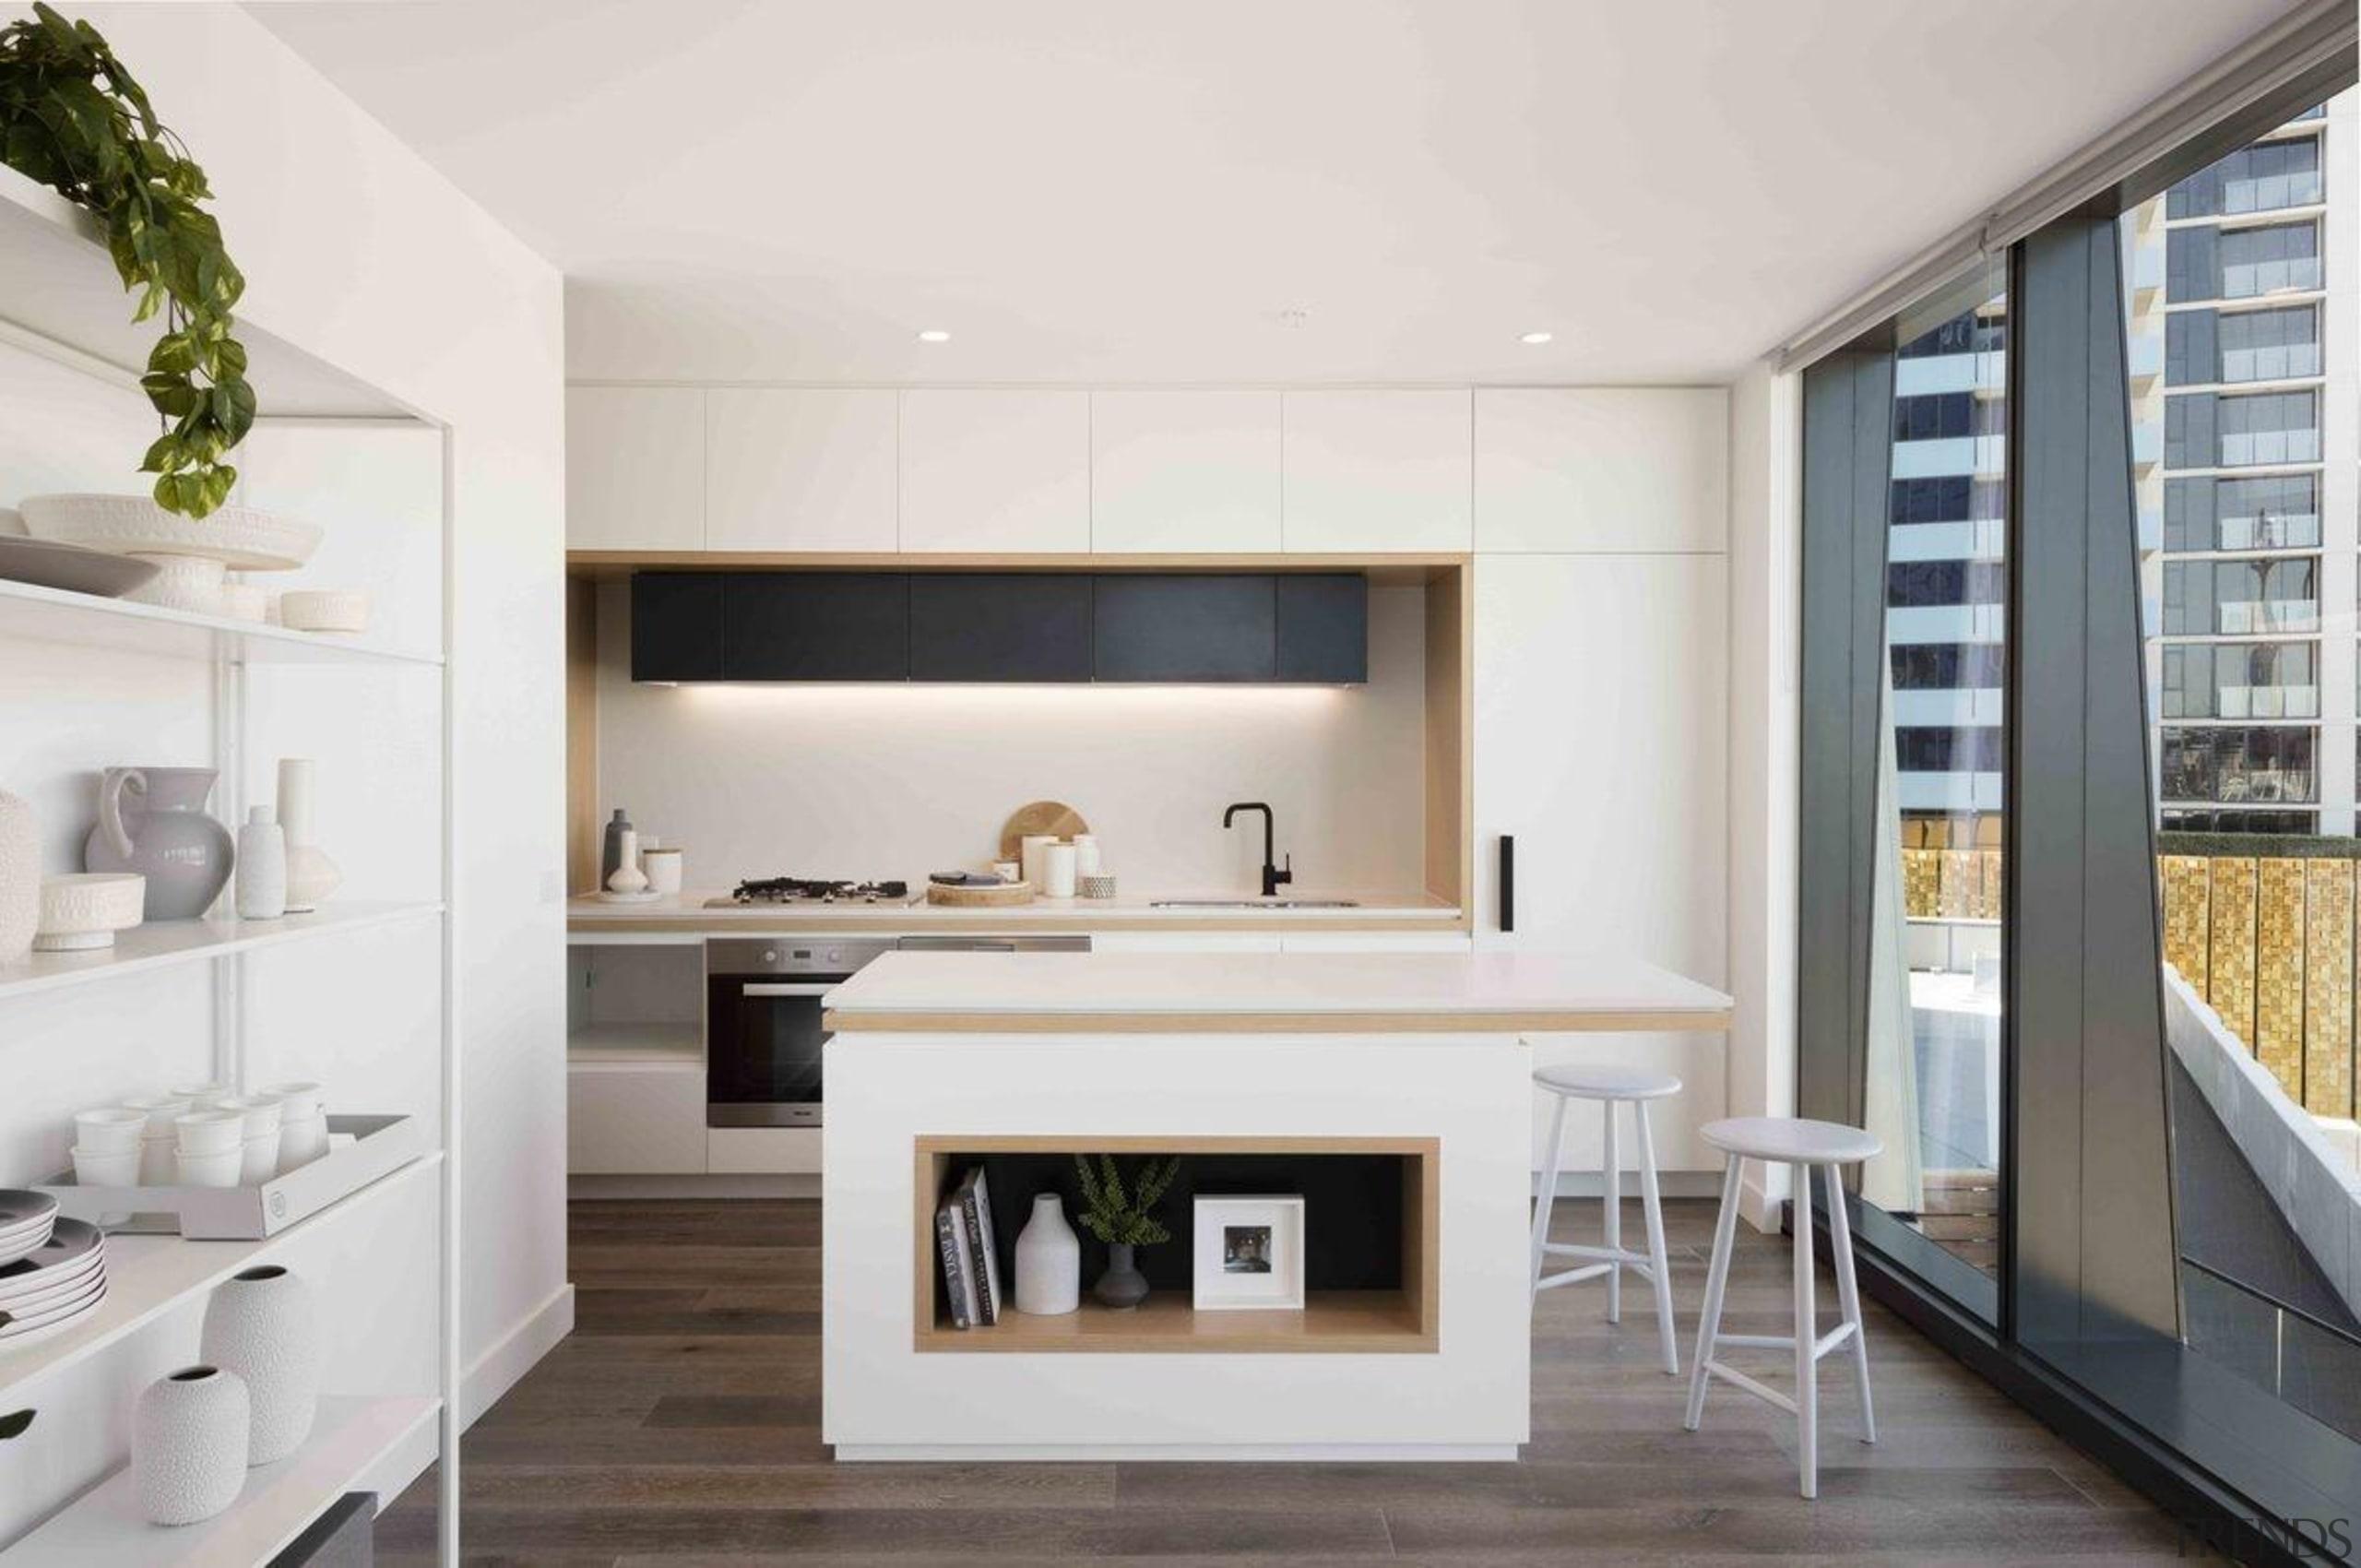 Promenade Aqui by Woods Bagot - Promenade Aqui interior design, kitchen, living room, white